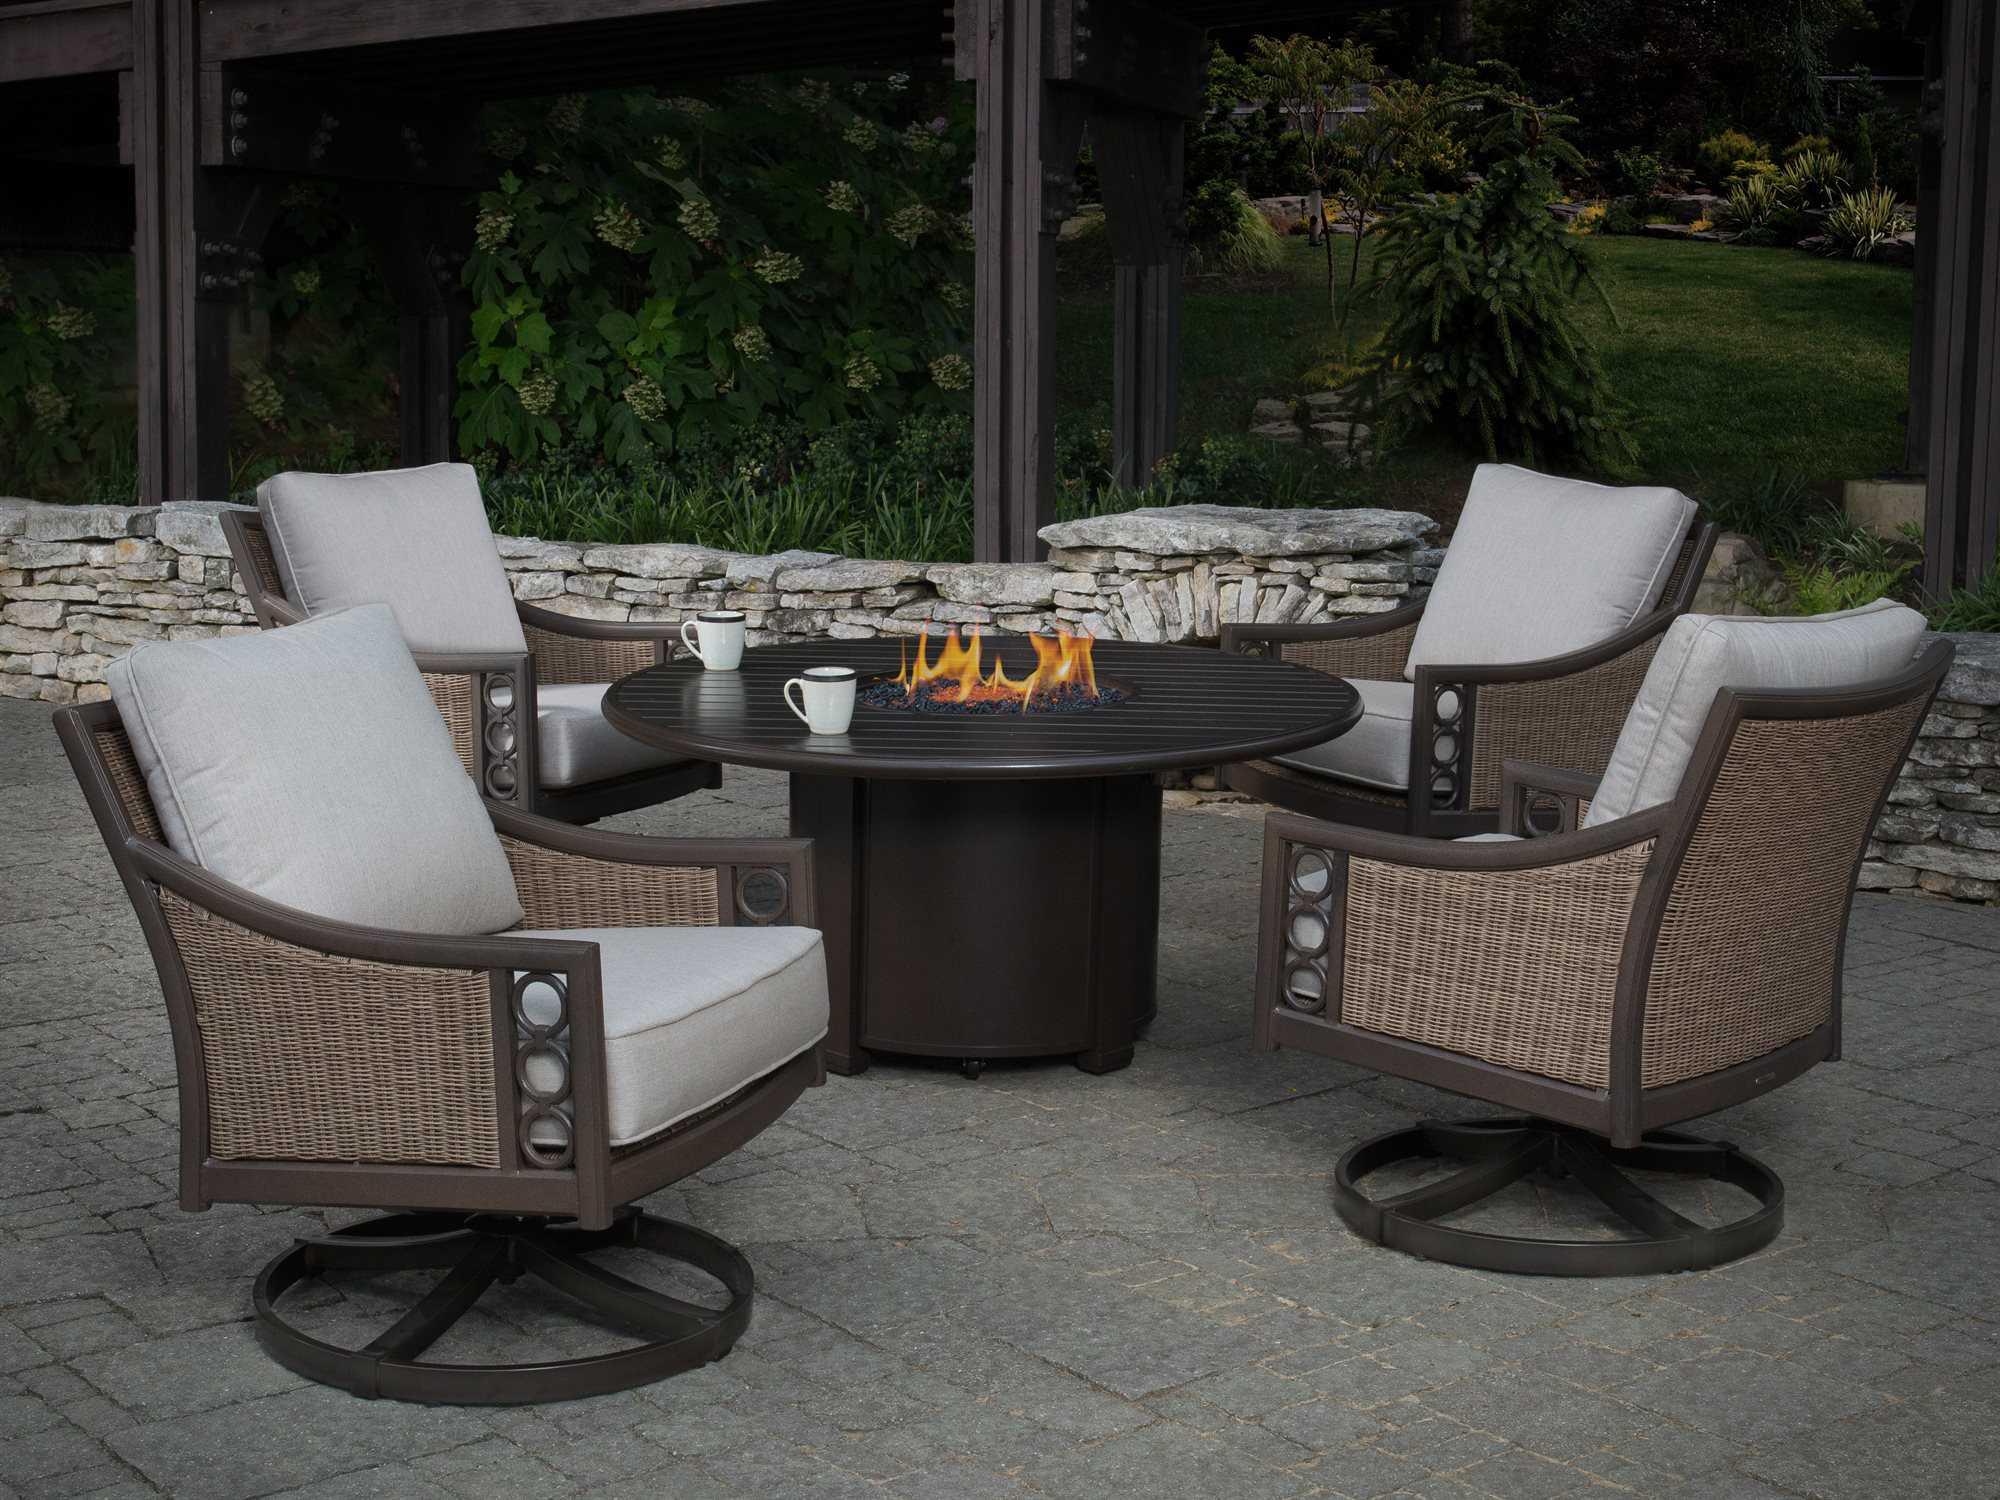 winston quick ship avignon wicker lounge set with 44 round firepit table wsavigfireset. Black Bedroom Furniture Sets. Home Design Ideas